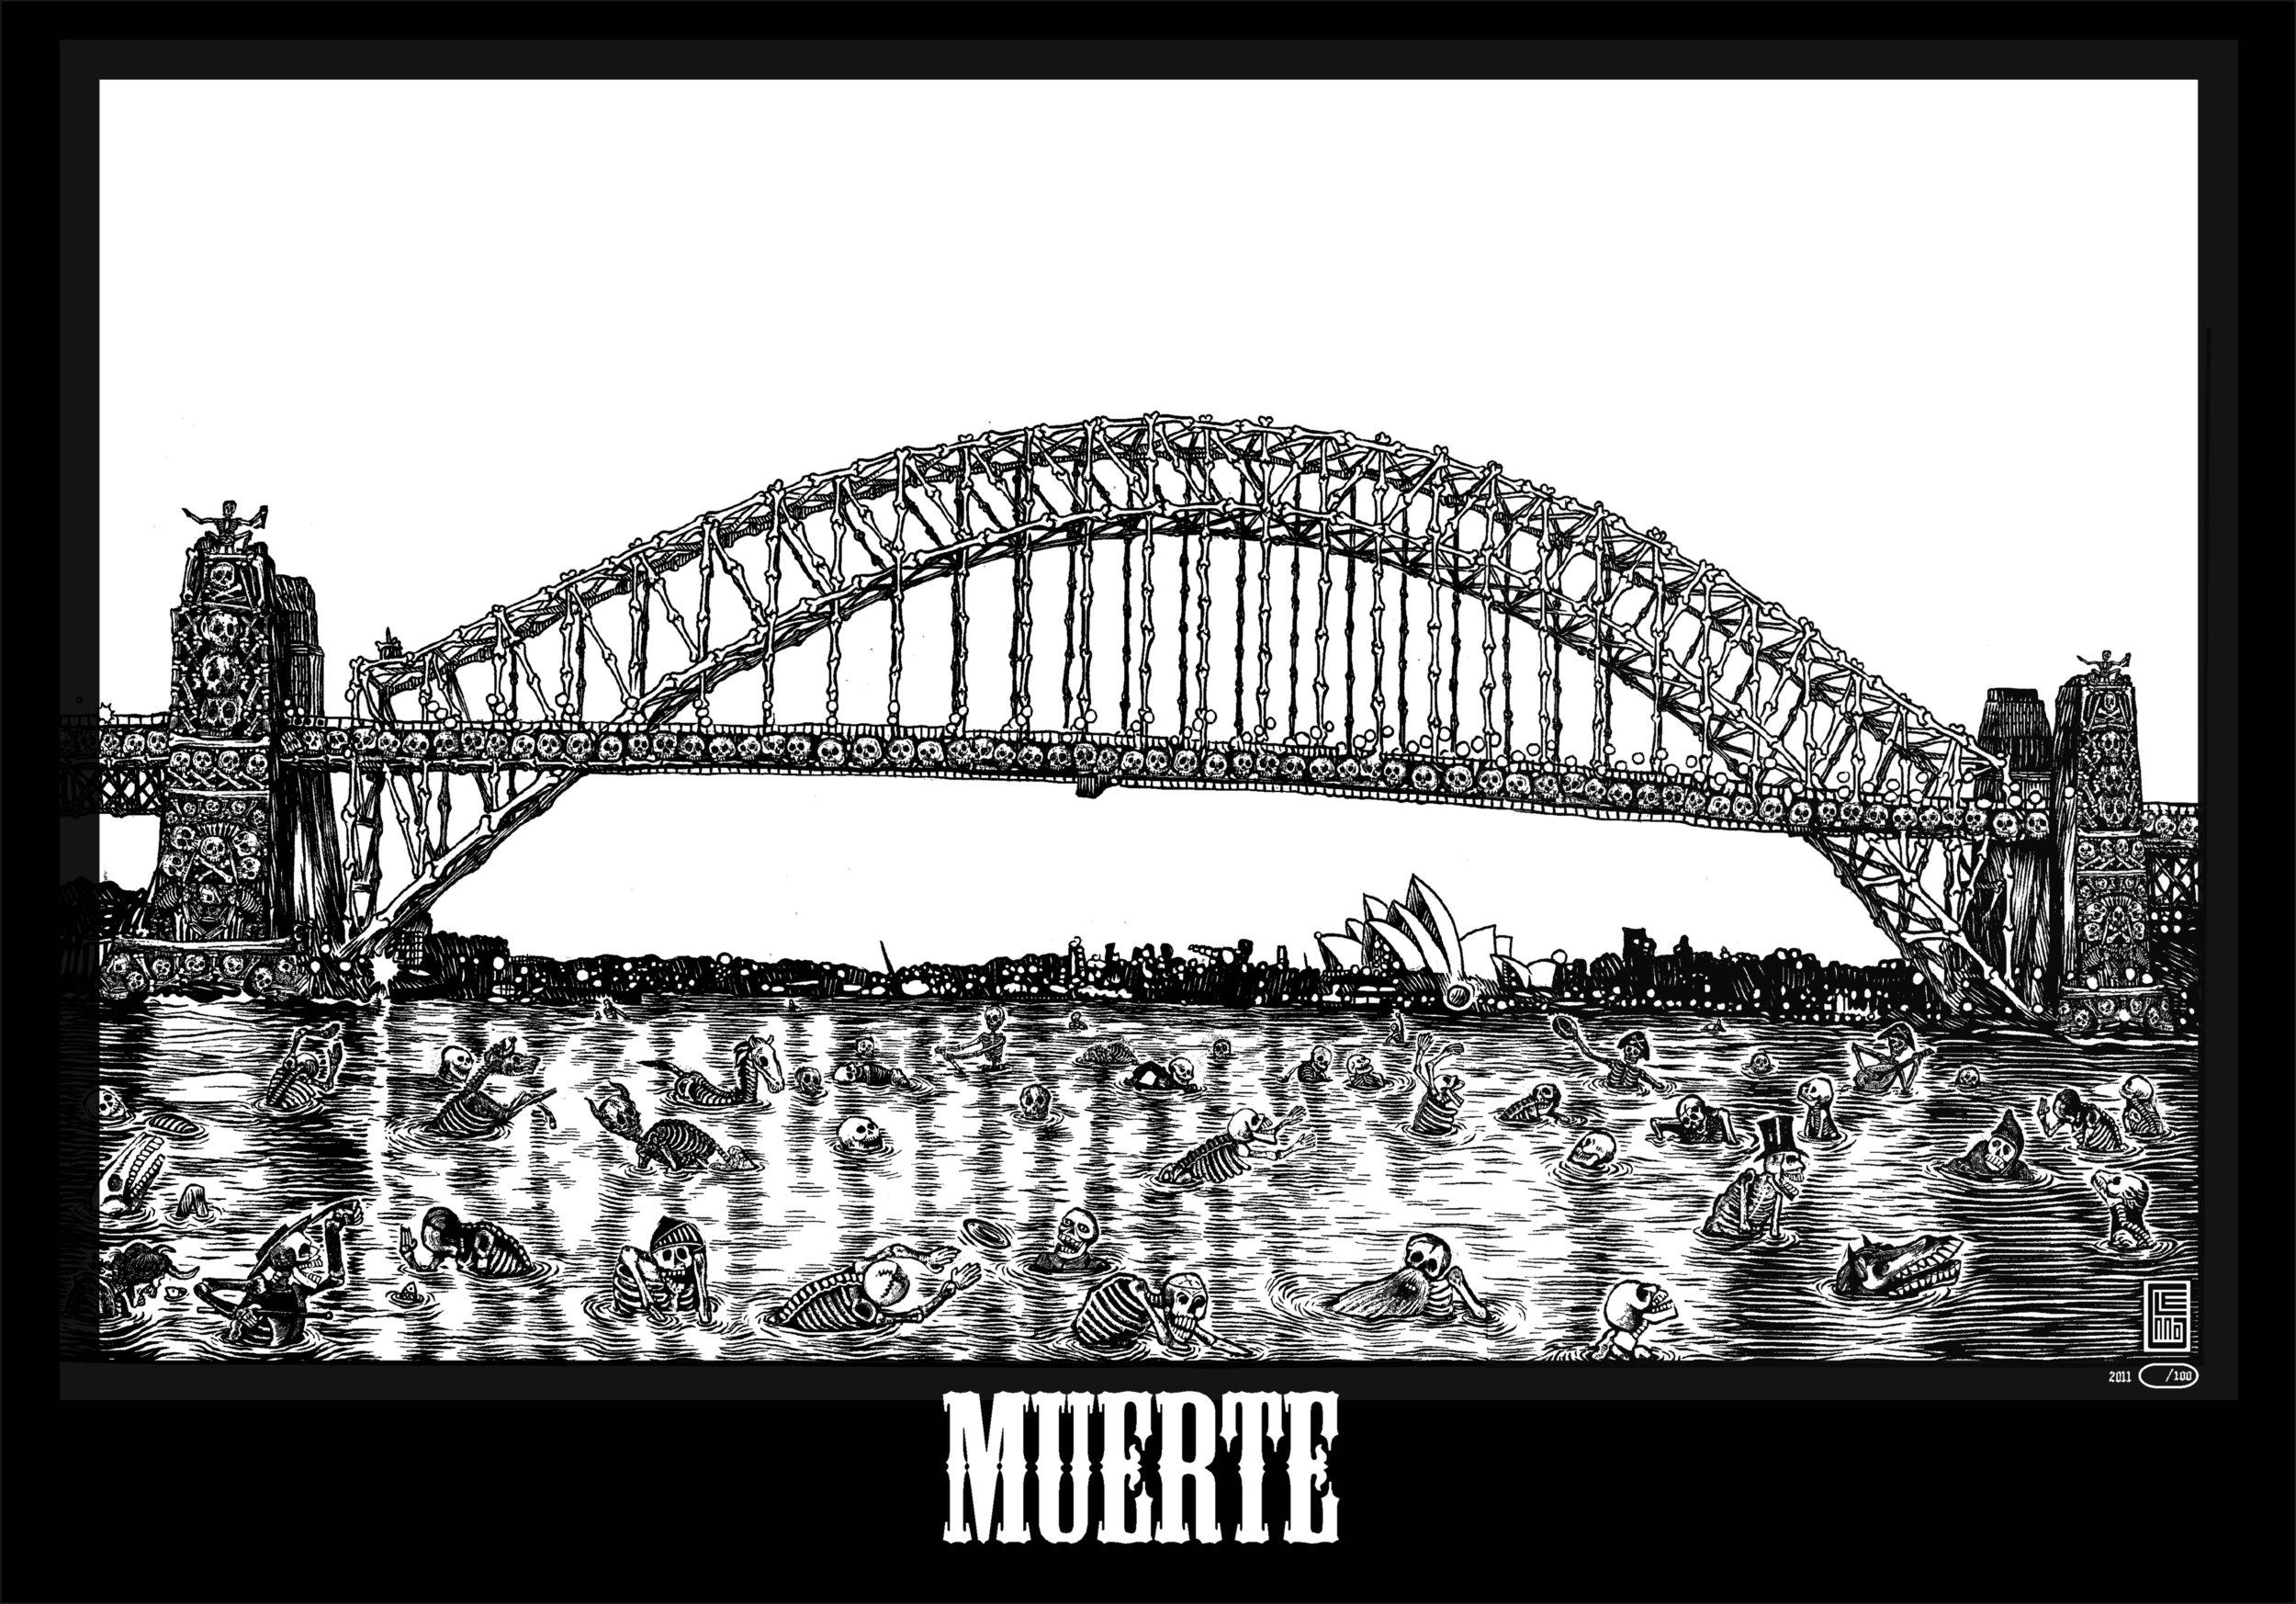 muerte harbour bridge.jpg